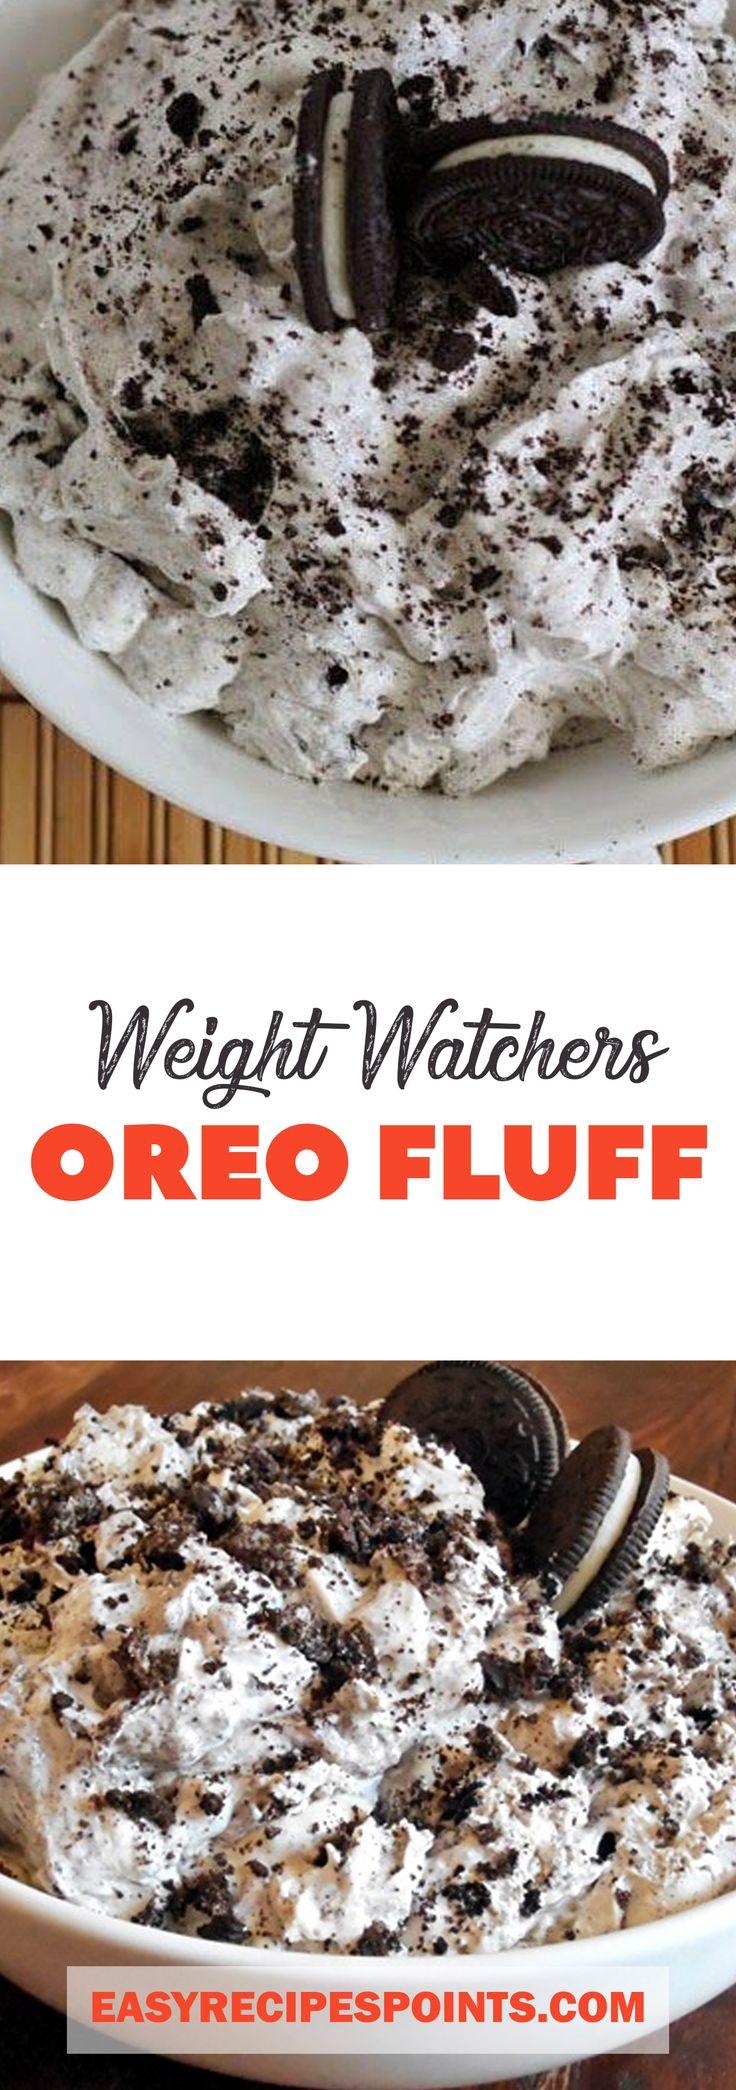 Weight Watchers Oreo Fluff ♥